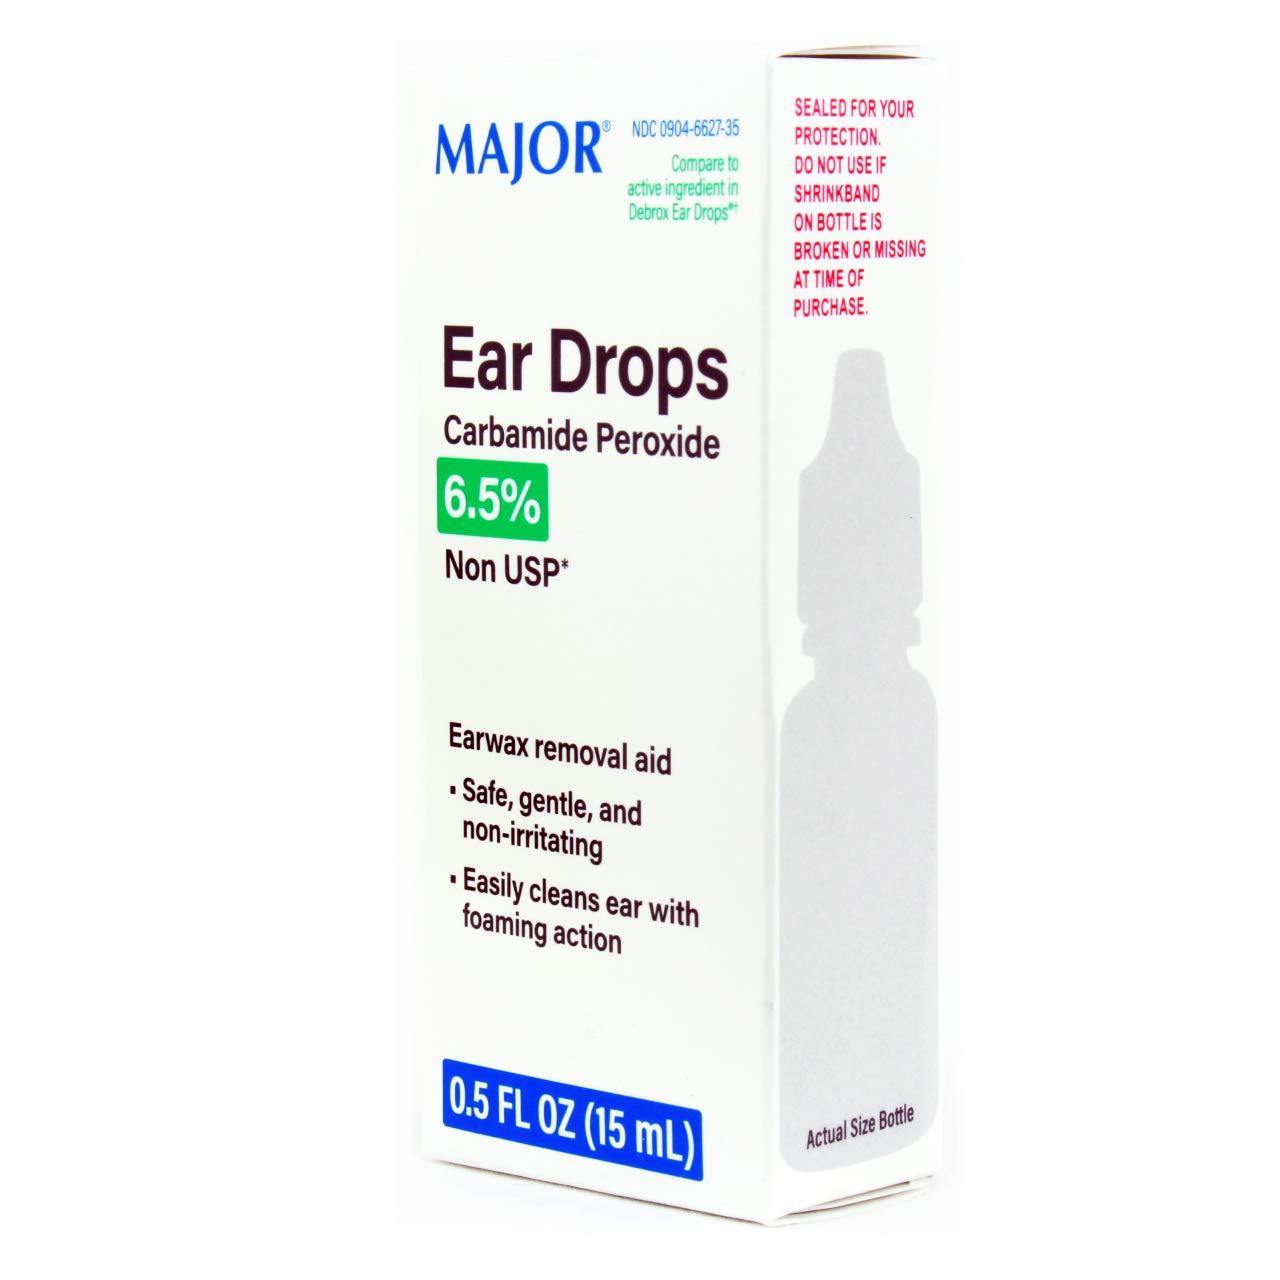 MAJOR Ear Drops Earwax Removal Aid 0.5oz 15mL CARBAMIDE PEROXIDE